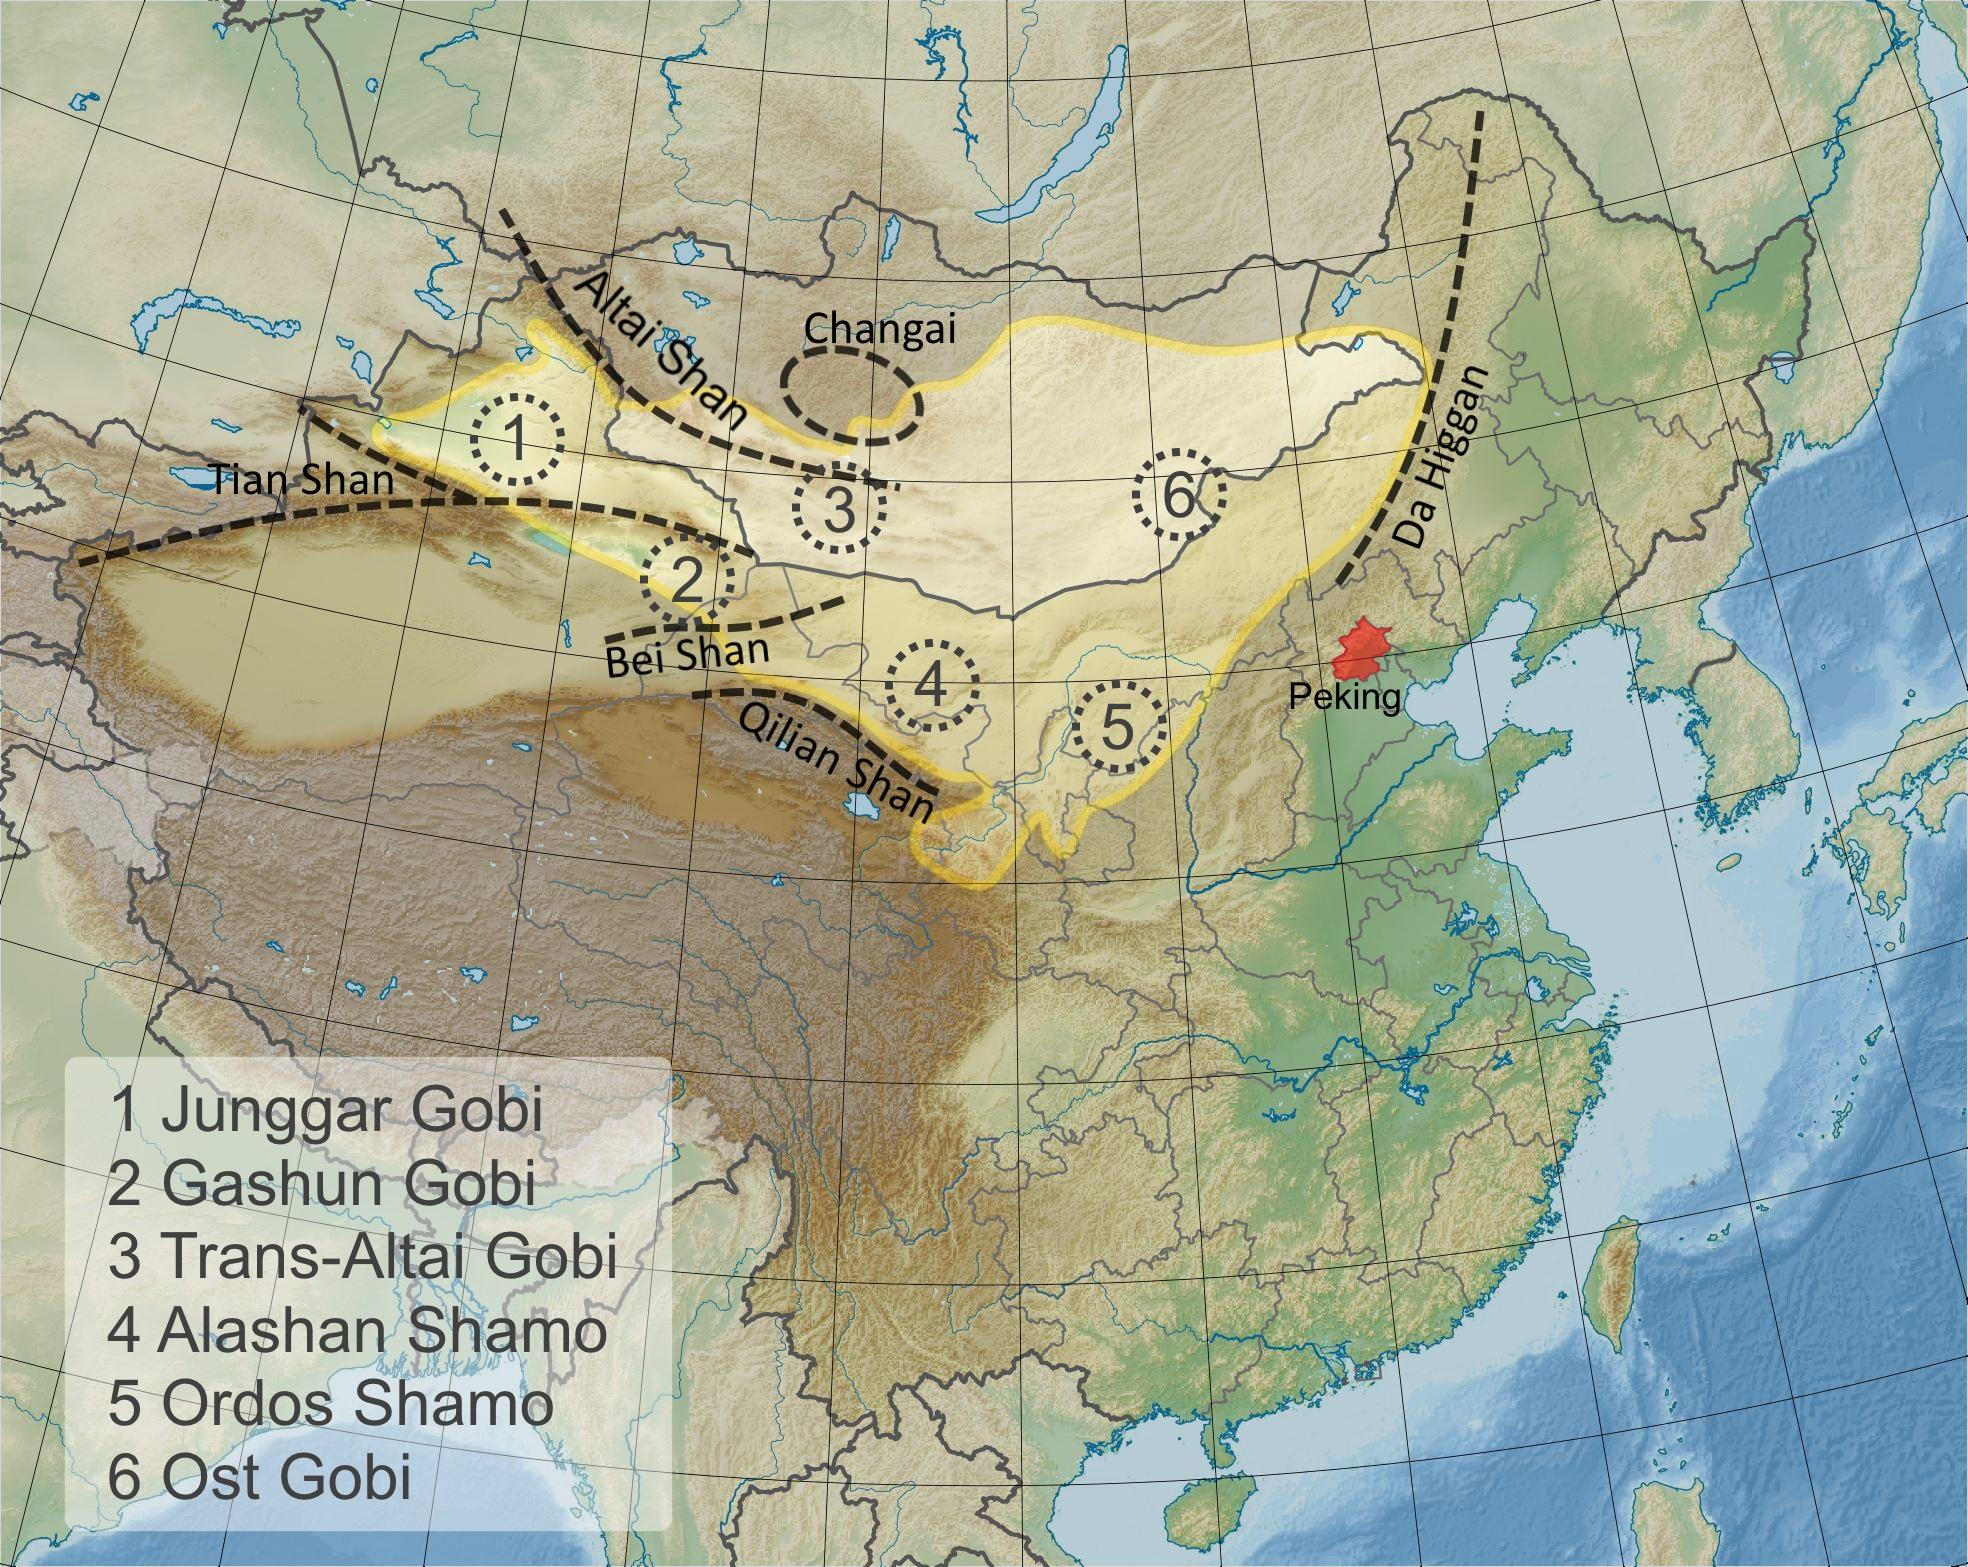 wüste gobi karte Gobi – Wikipedia wüste gobi karte